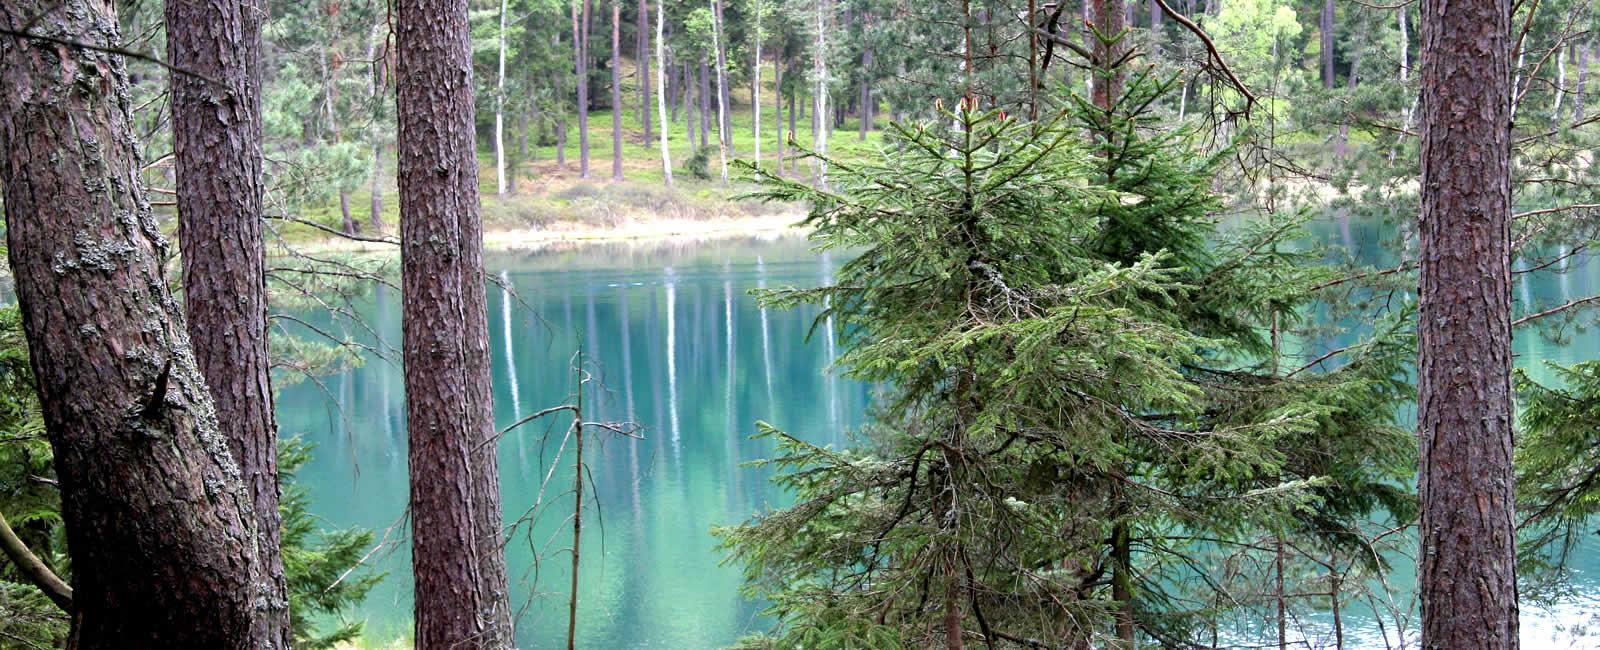 Jezioro Kocioł, Fot. Beata Grabowska